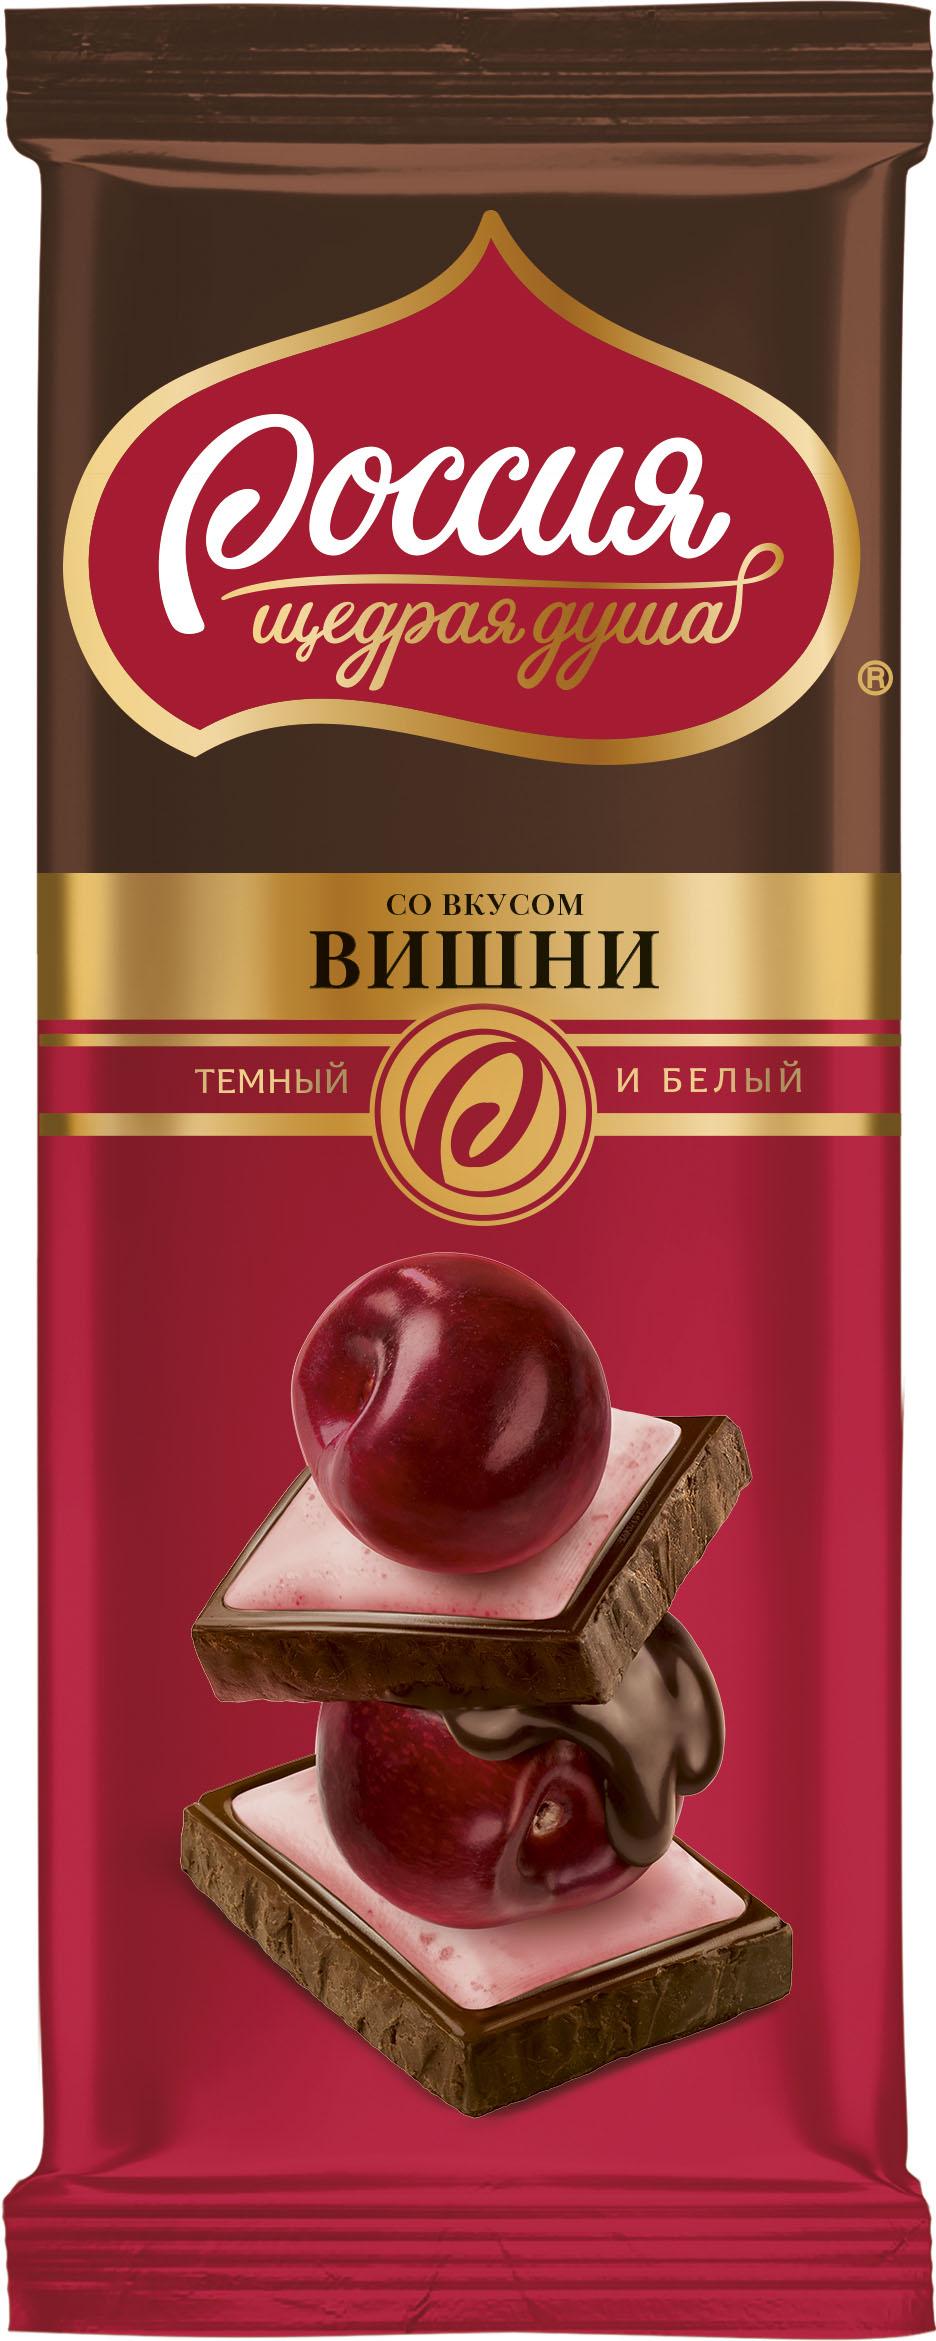 Шоколад Россия темный белый вишня 85 г